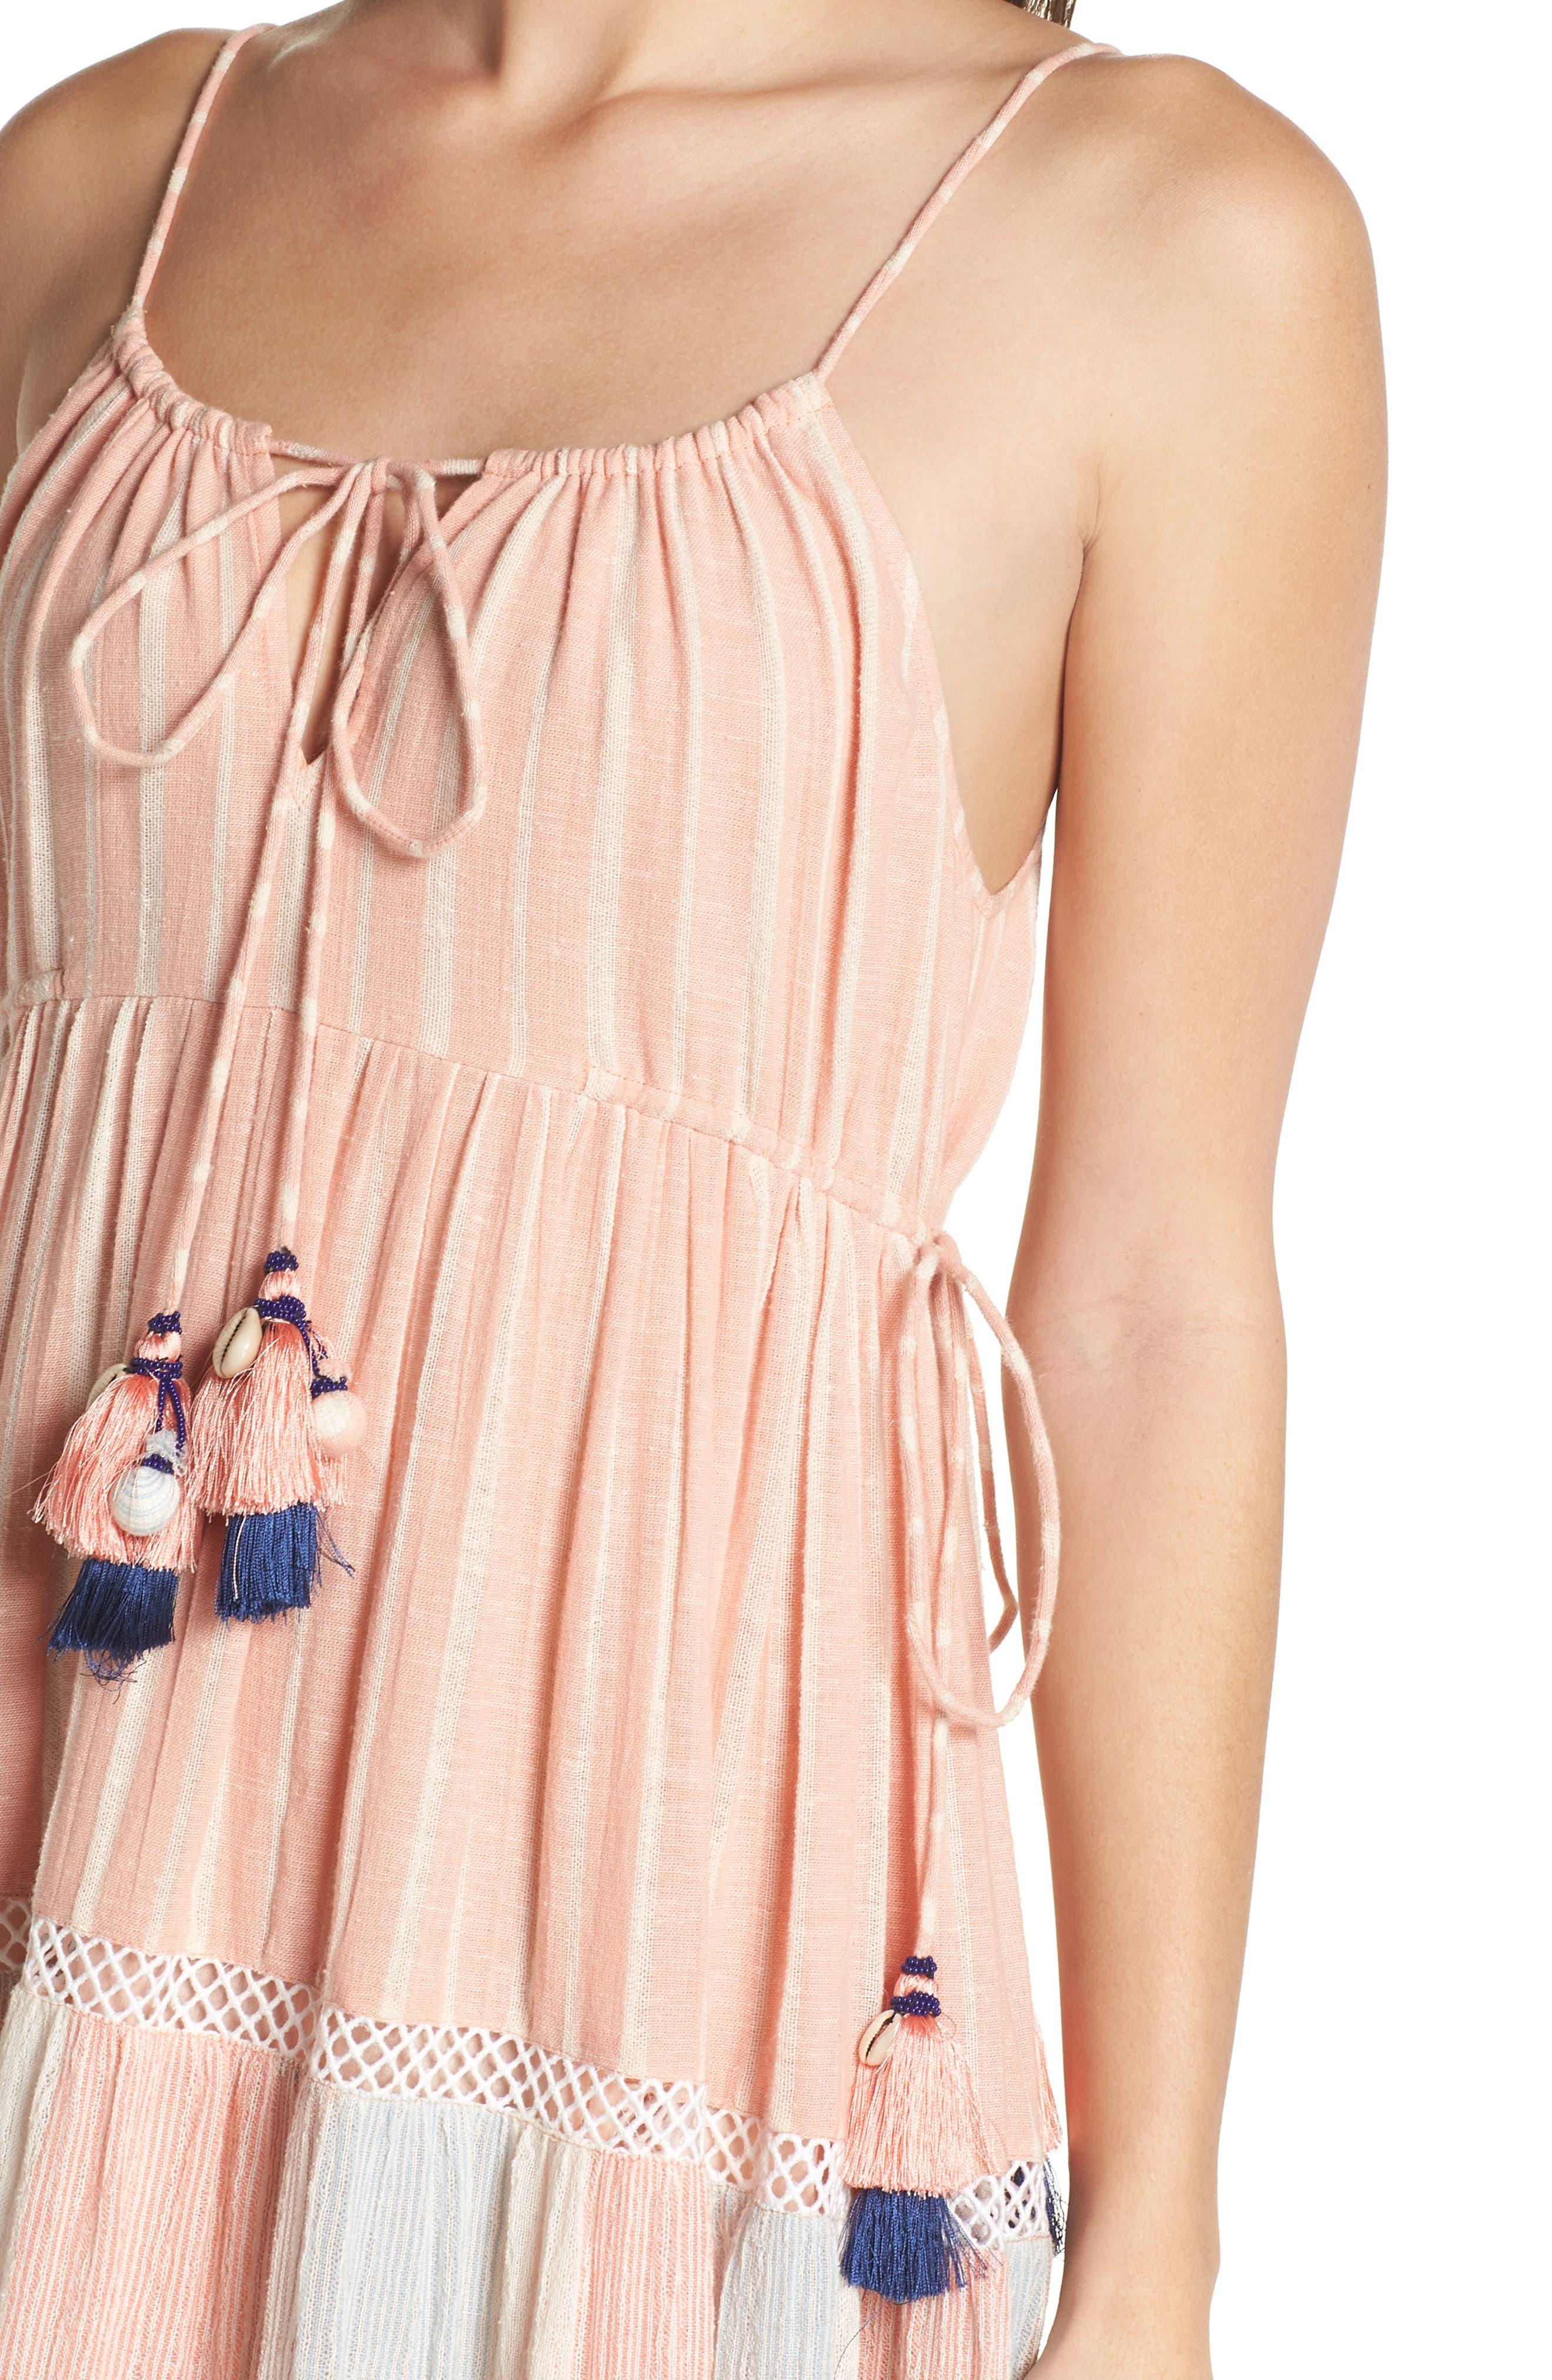 Hemant & Nandita Cover-Up Maxi Dress,                             Alternate thumbnail 4, color,                             Peach